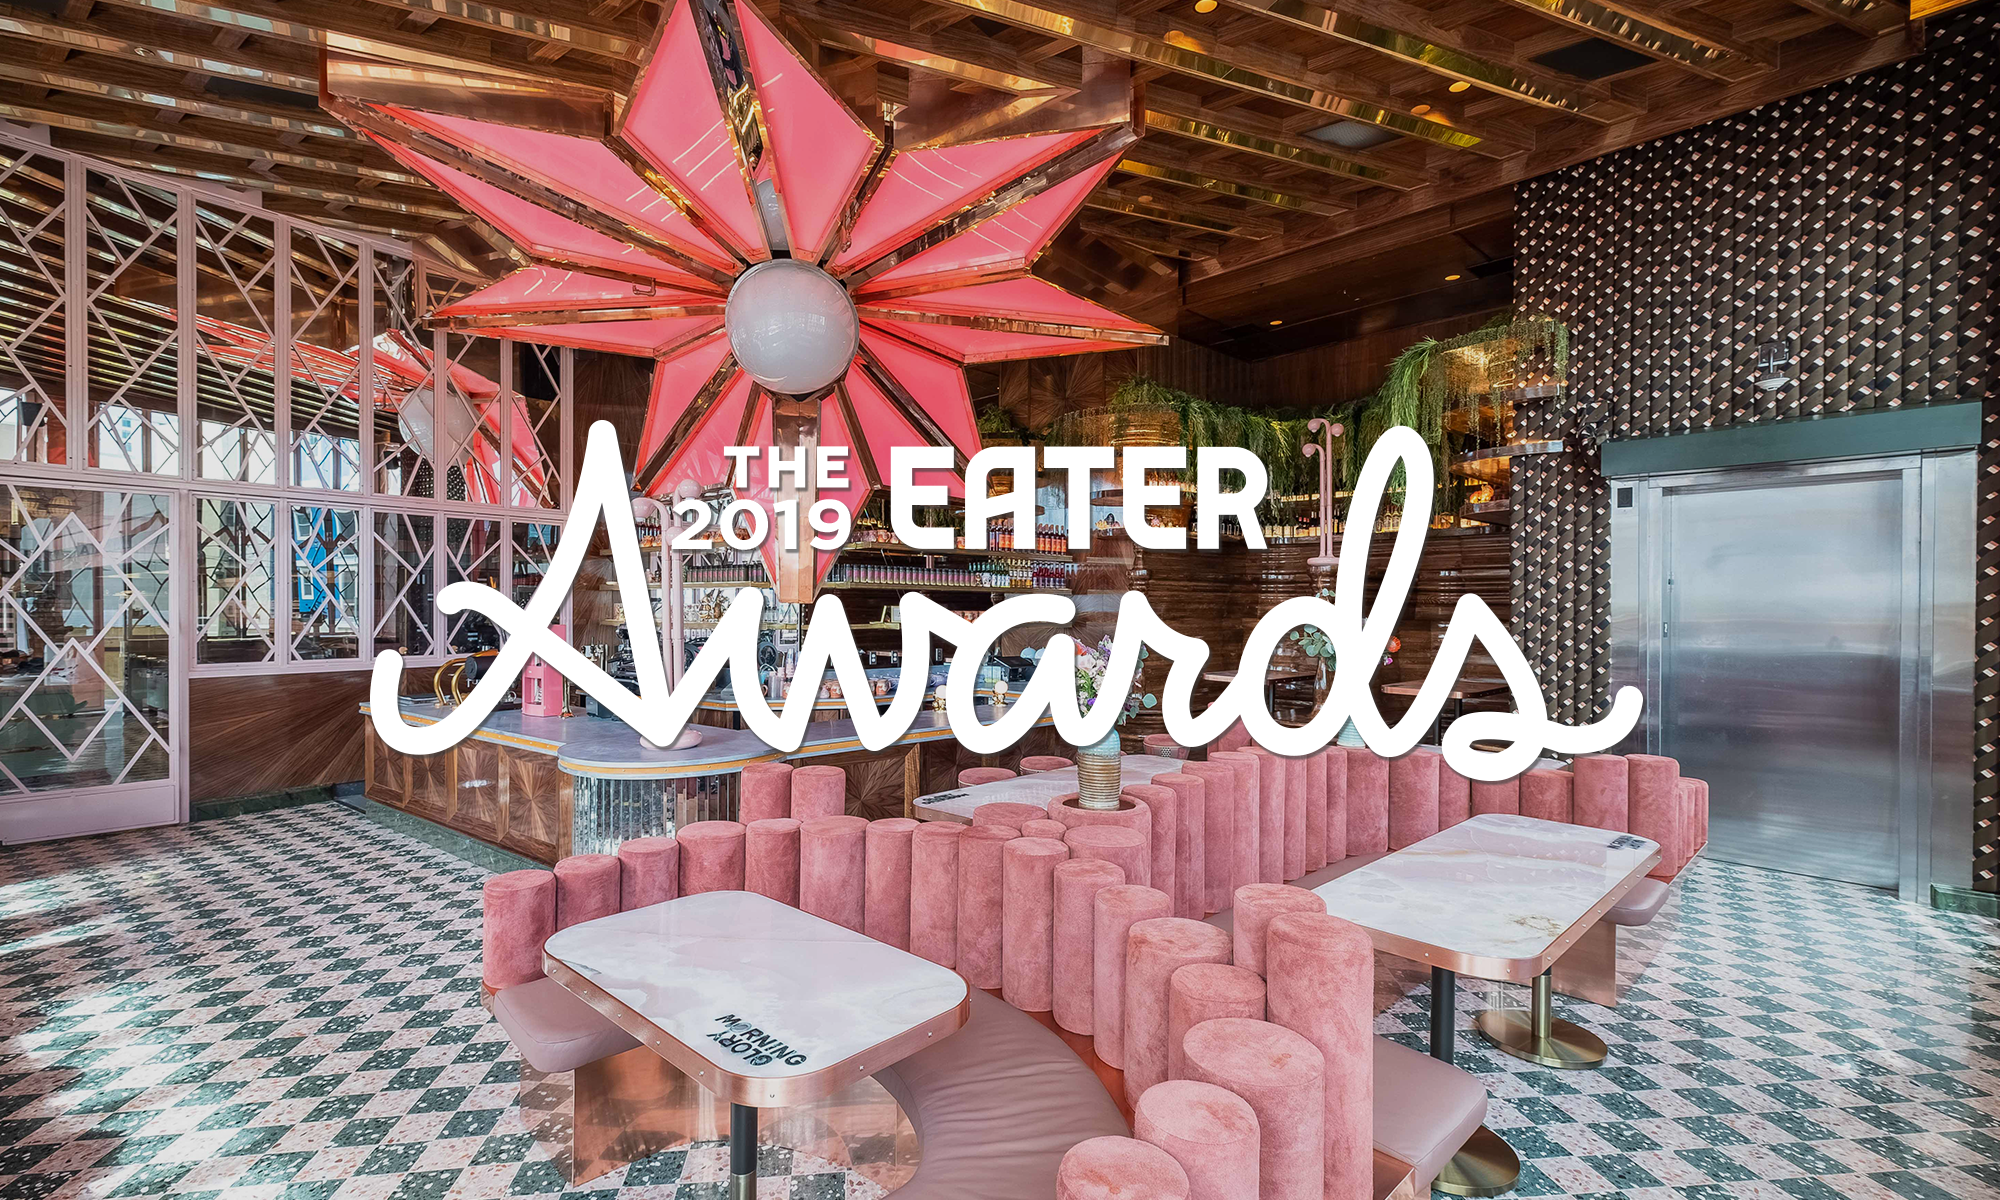 San Diego's 2019 Eater Award Winners